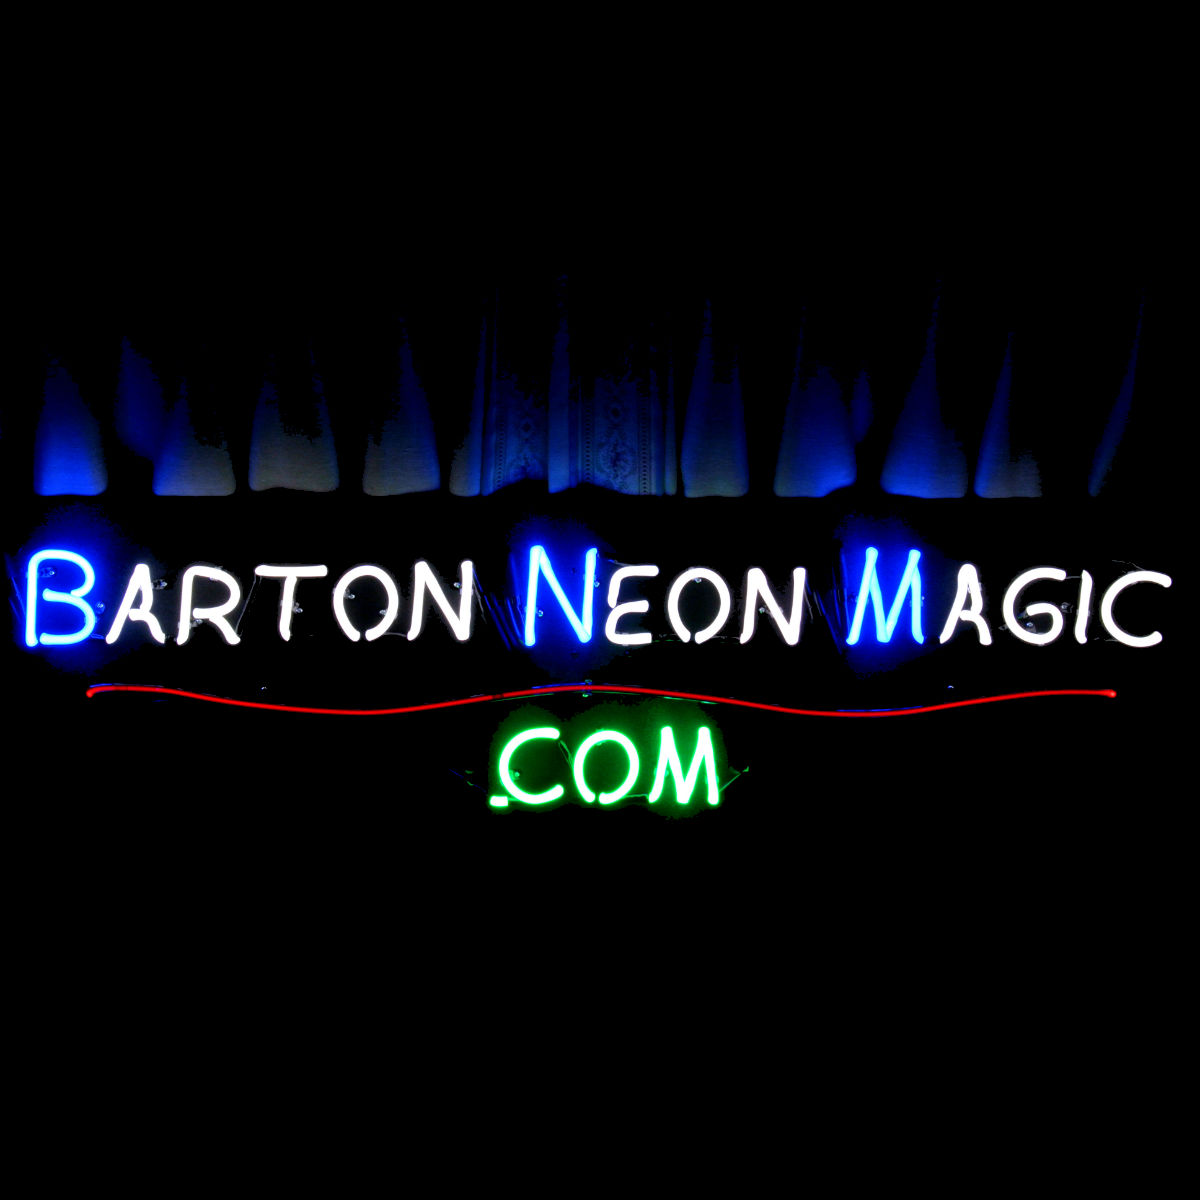 PACKARD CARIBBEAN NEON SIGN by John Barton - BartonNeonMagic.com